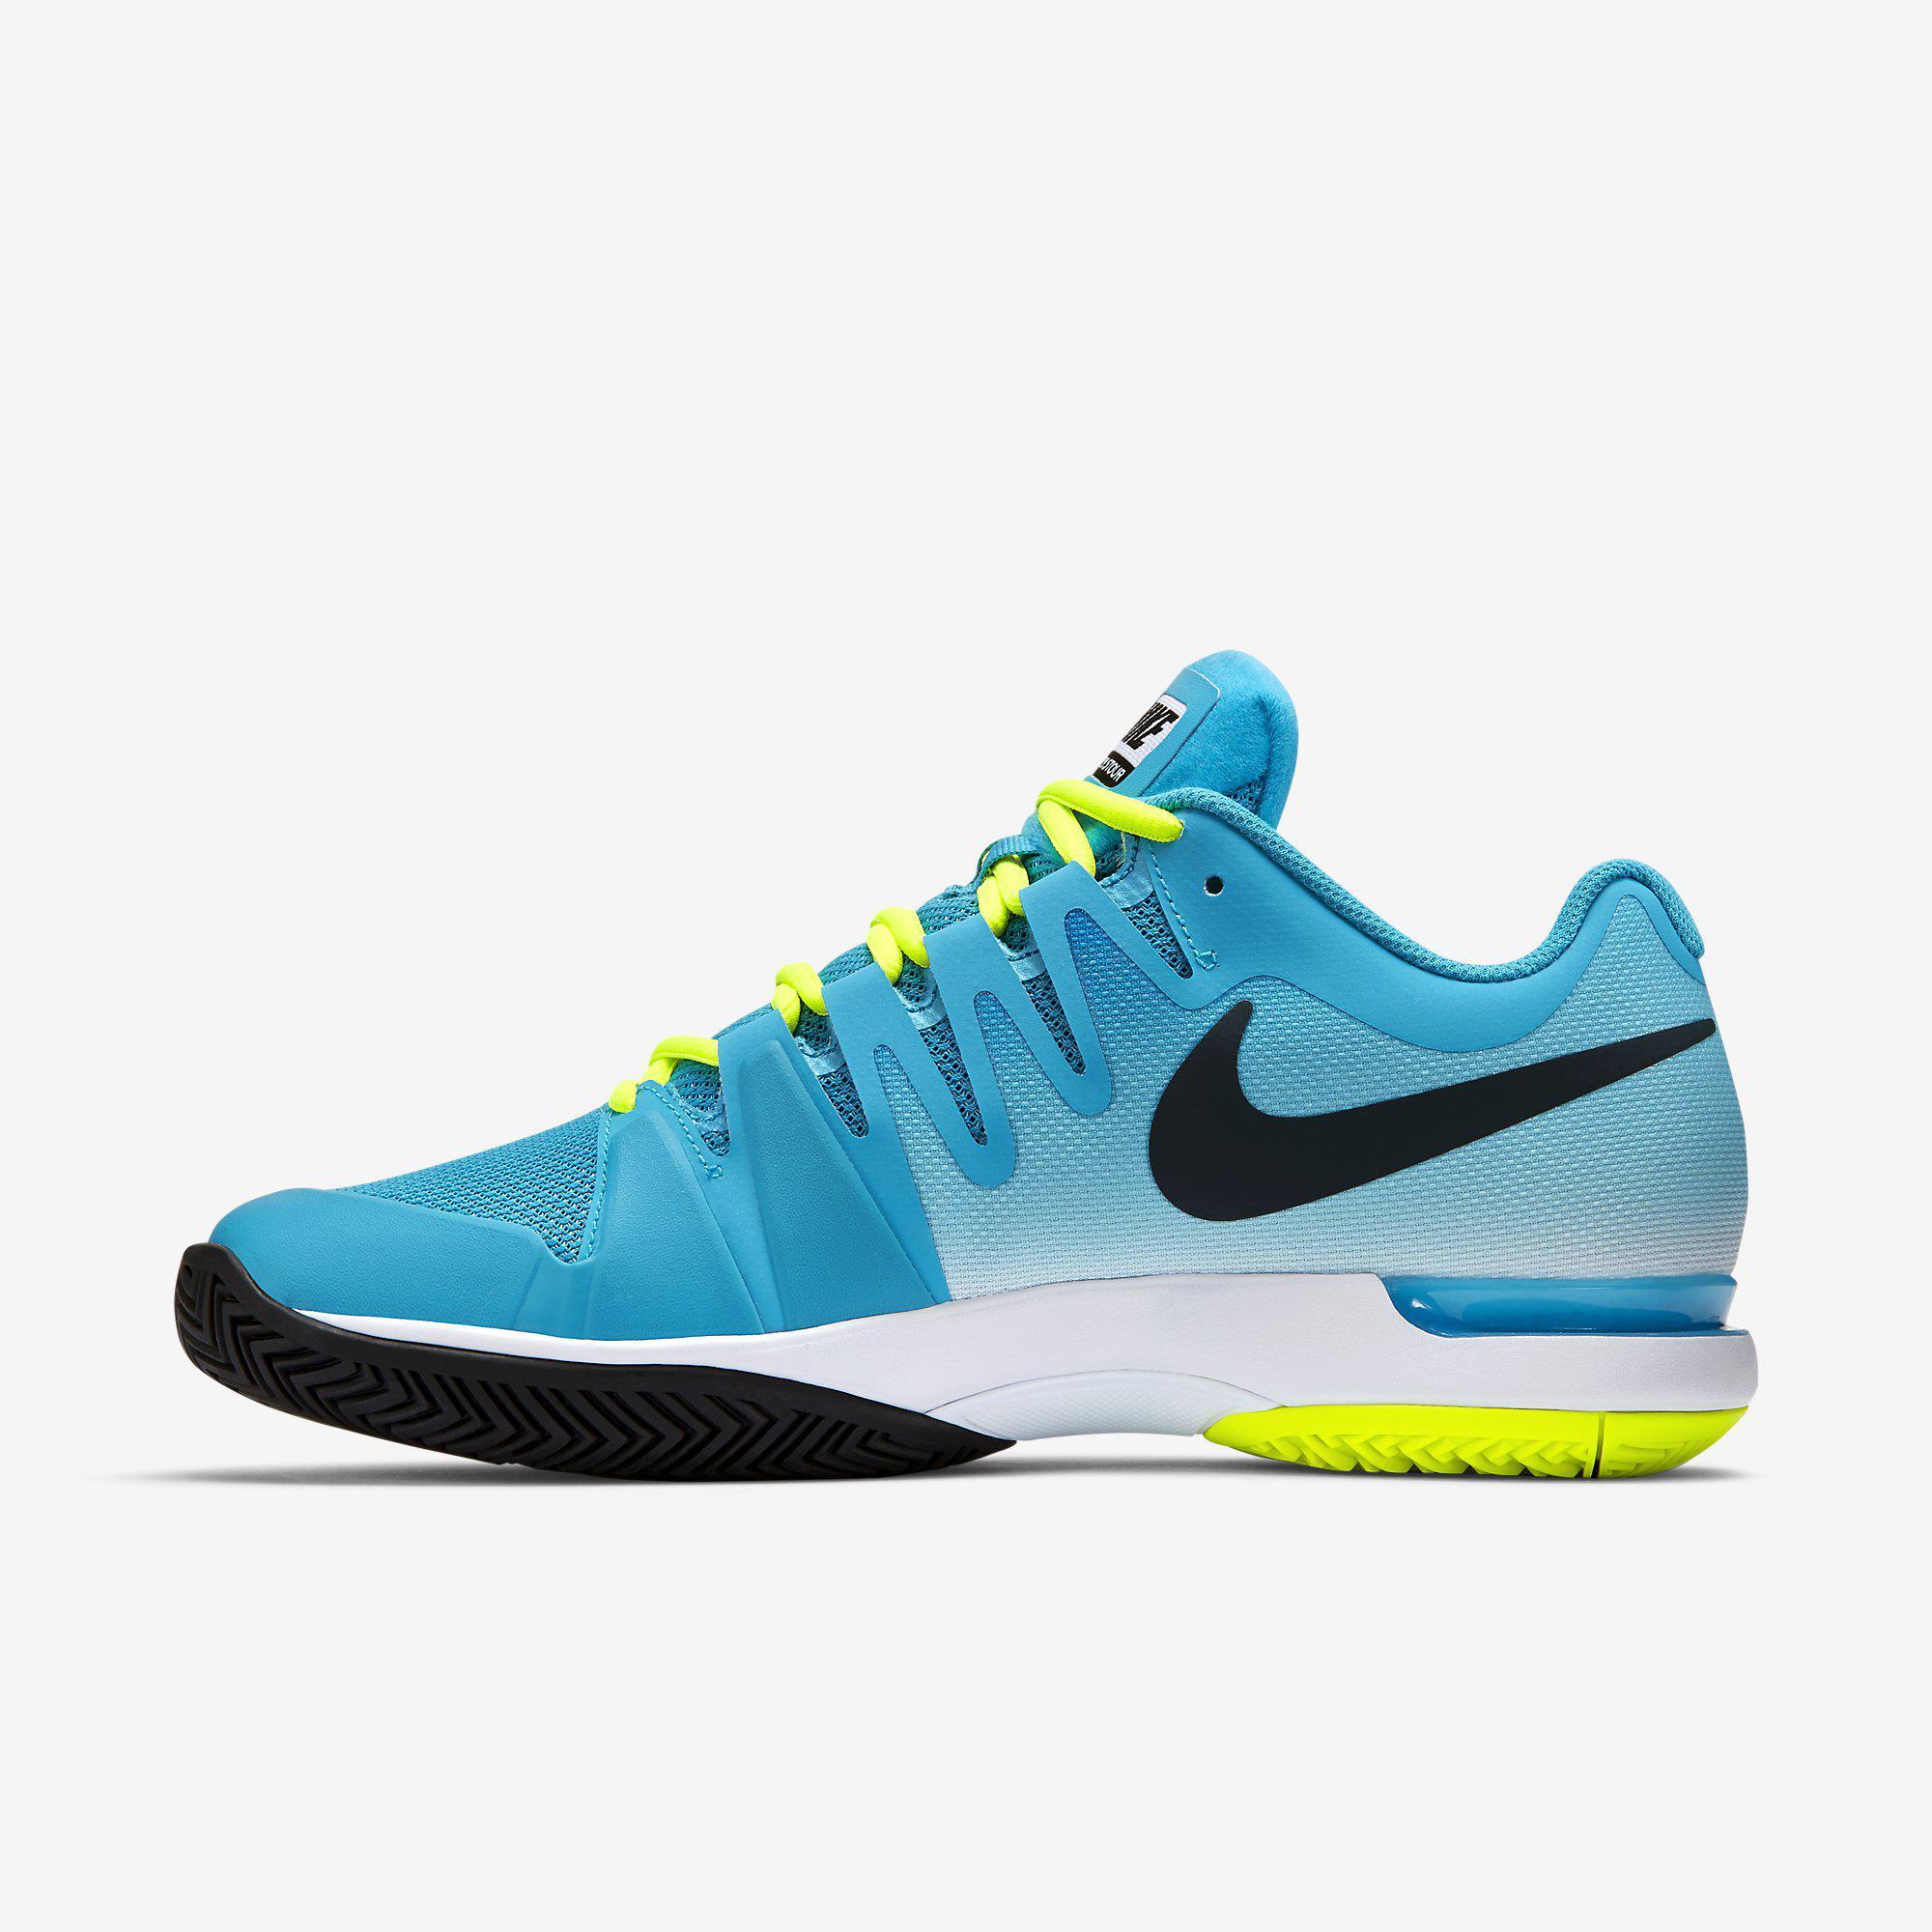 Granjero Completo Acumulativo  Nike Mens Zoom Vapor 9.5 Tour Tennis Shoes - Blue/Yellow - Tennisnuts.com